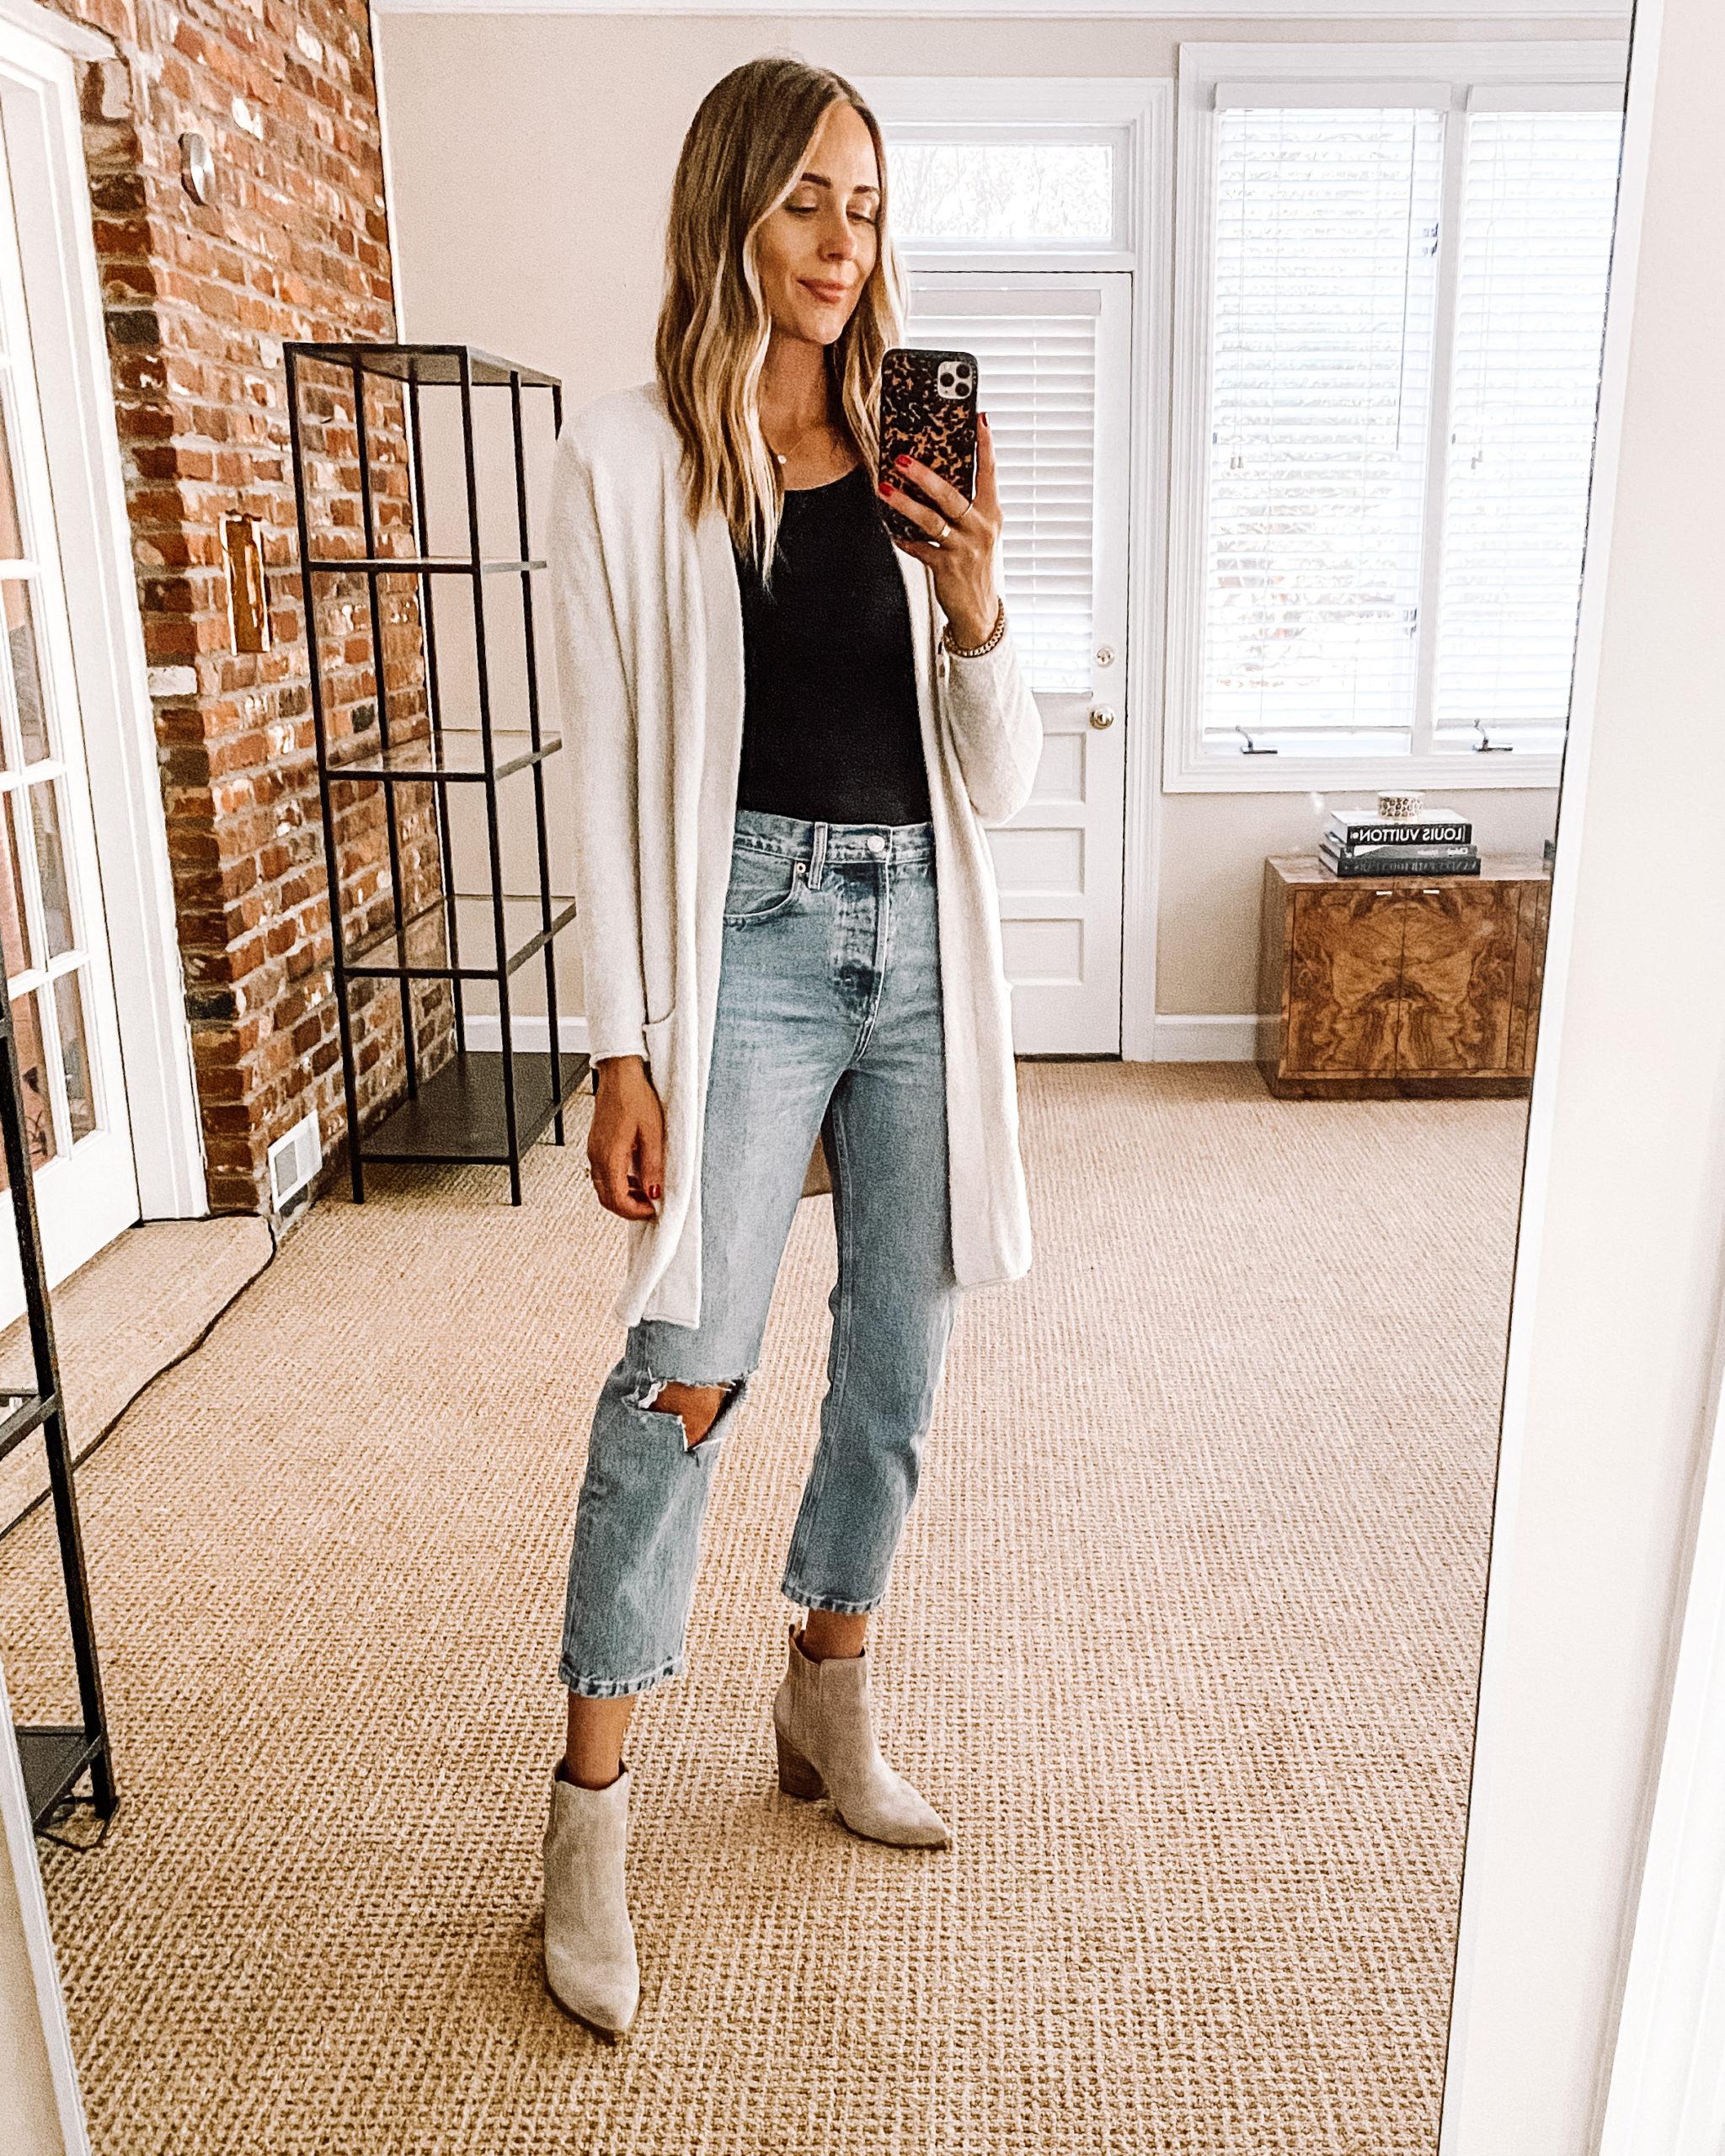 Fashion Jackson Nordstrom Anniversary Sale Barefoot Dreams Cardigan Black Bodysuit Topshop Ripped Jeans Tan Booties